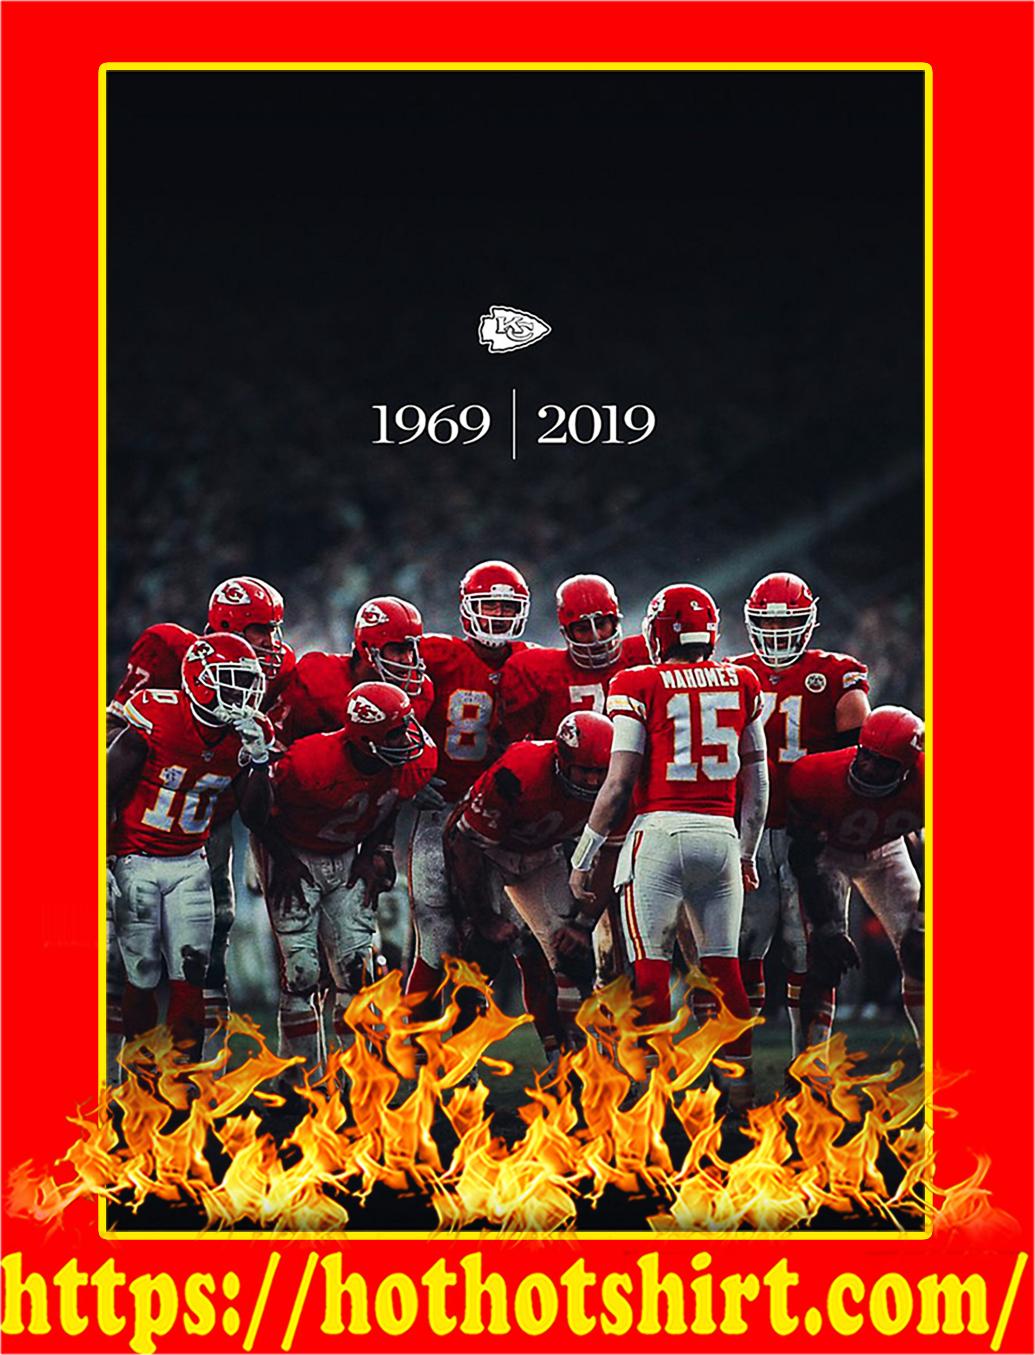 Kansas City Chiefs 1969 2019 Super Bowl Champions Poster - A1